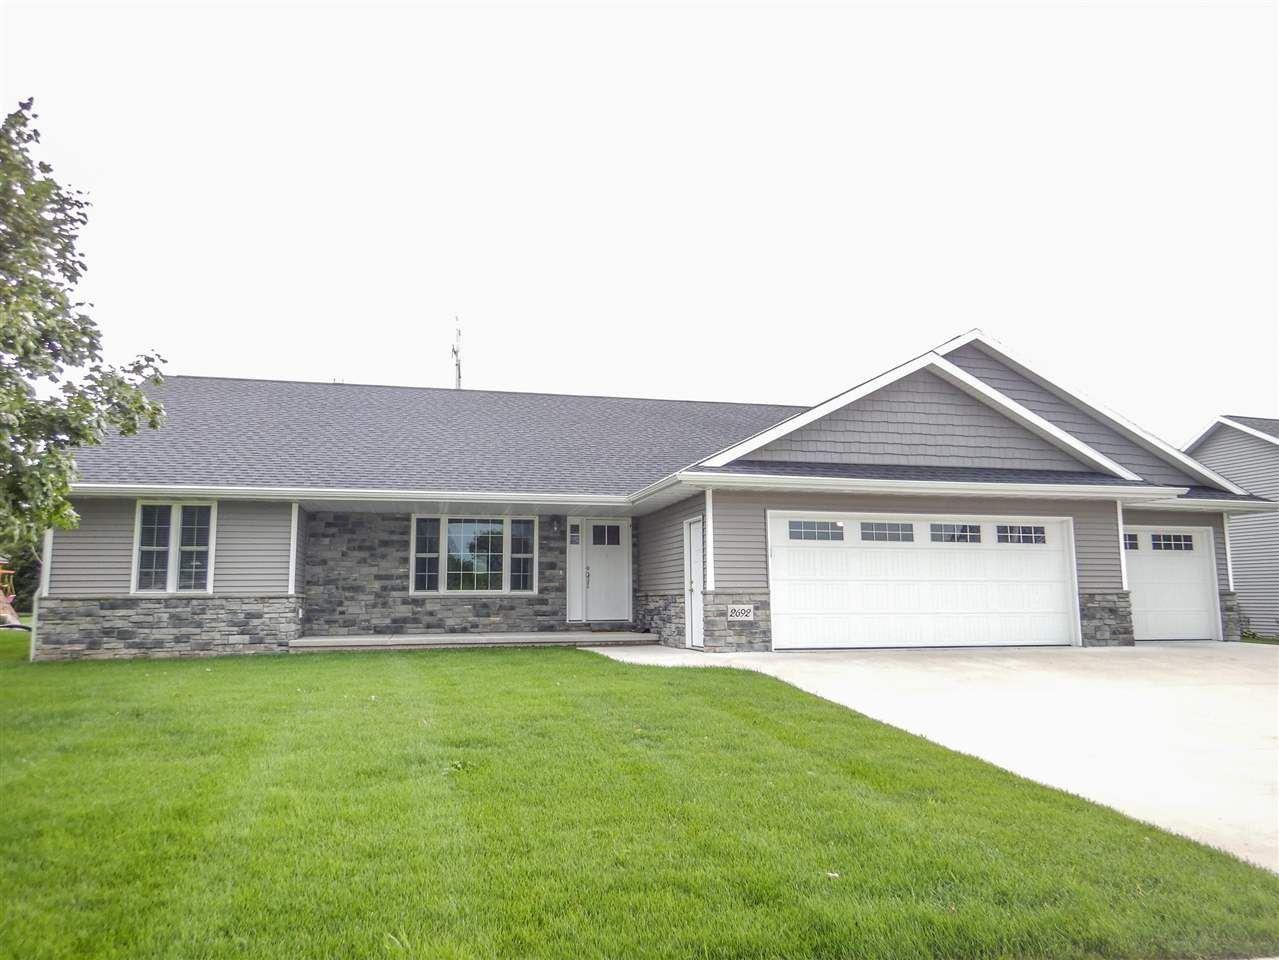 2692 SUSSEX Road, Green Bay, WI 54311 - MLS#: 50246242